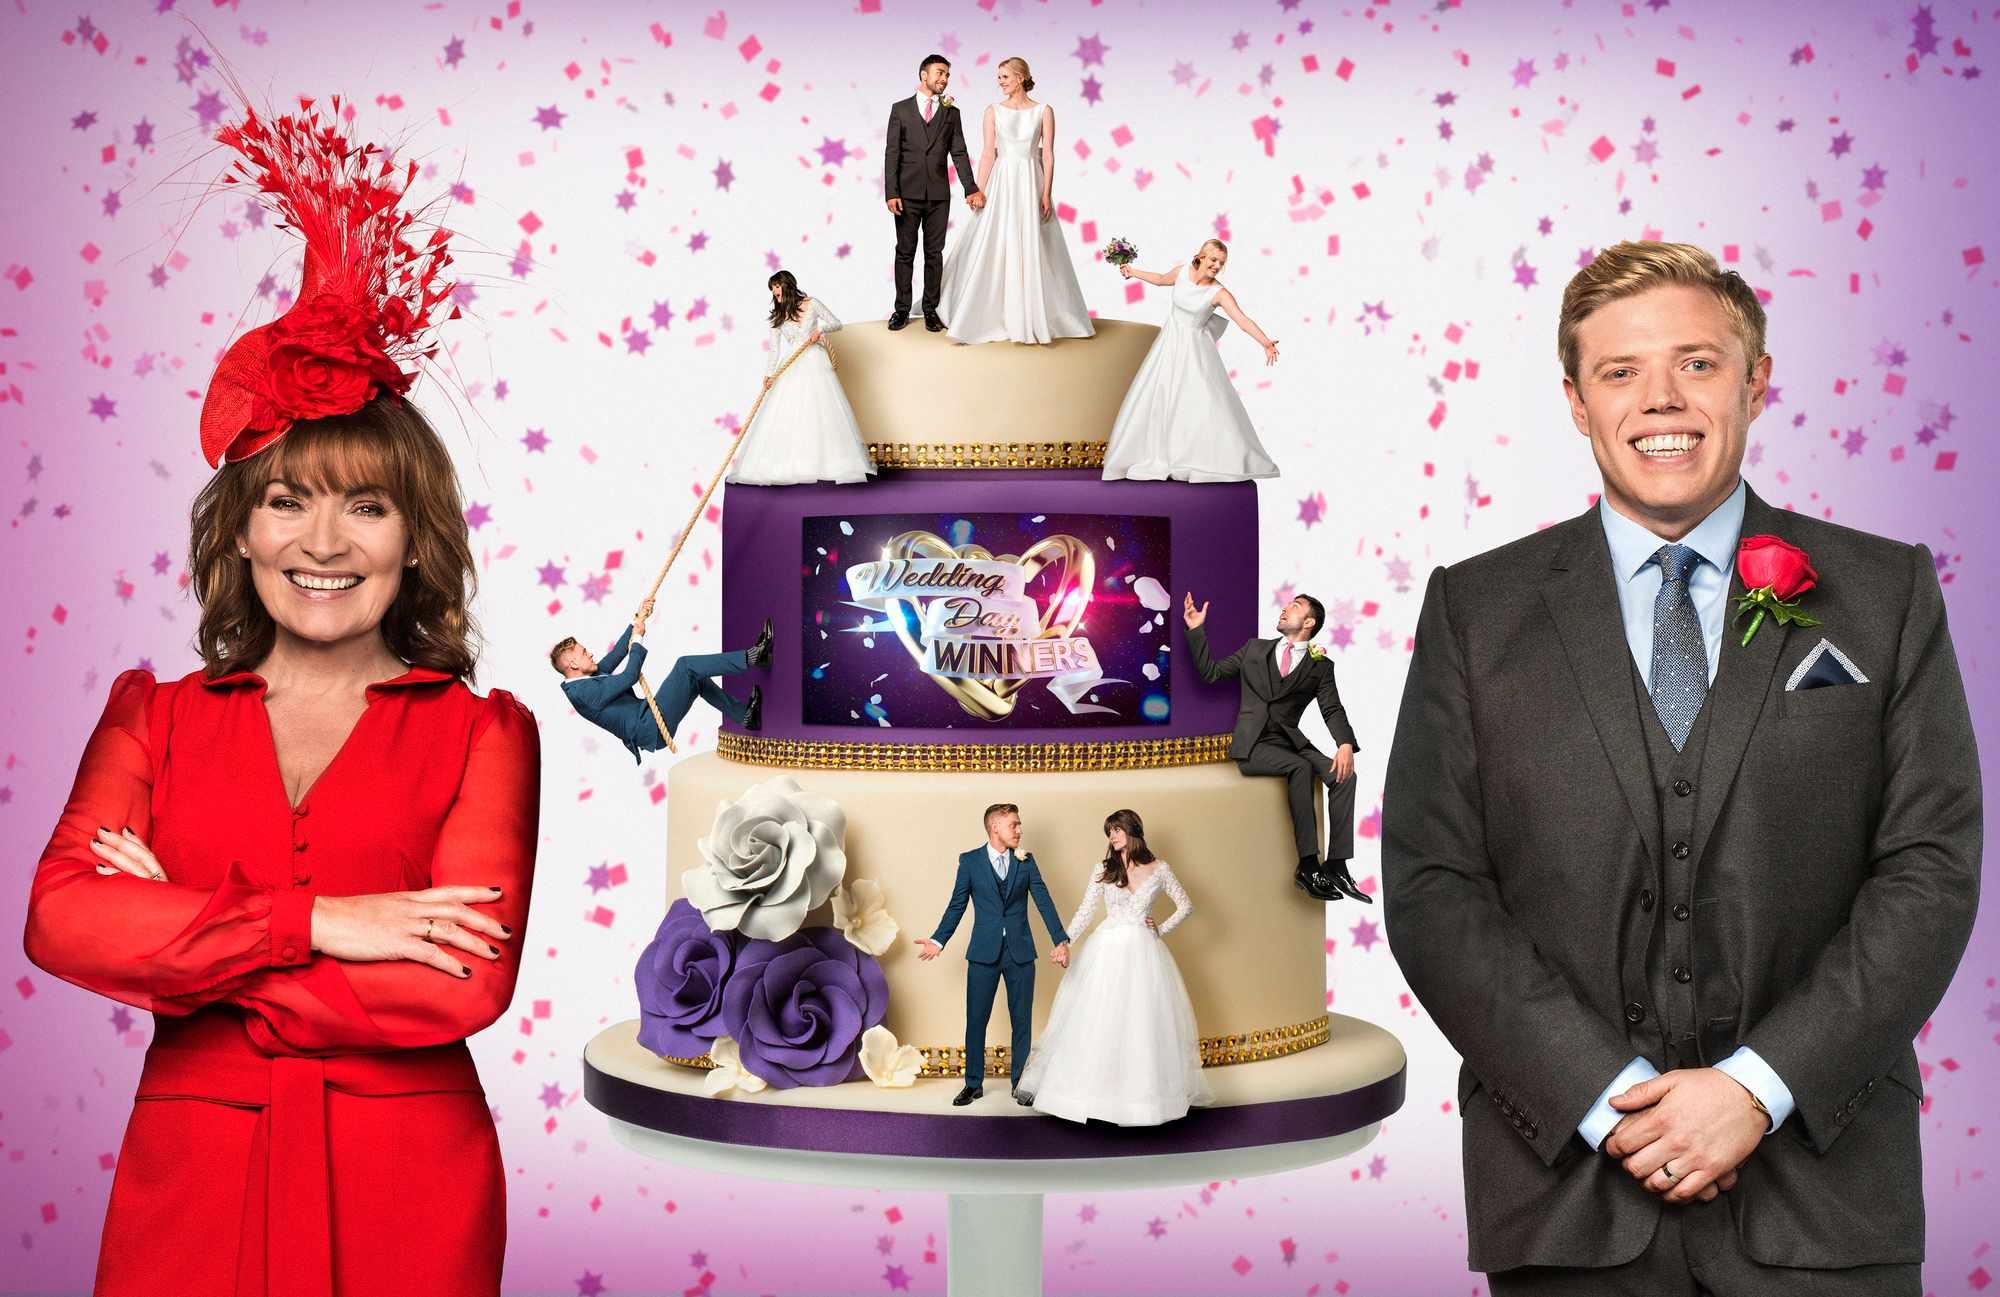 WARNING: Embargoed for publication until 00:00:01 on 27/12/2017 - Programme Name: Wedding Day Winners - TX: n/a - Episode: Wedding Day Winners generics (No. n/a) - Picture Shows:  Lorraine Kelly, Rob Beckett - (C) Panda TV - Photographer: Ray Burmiston (BBC, BA)